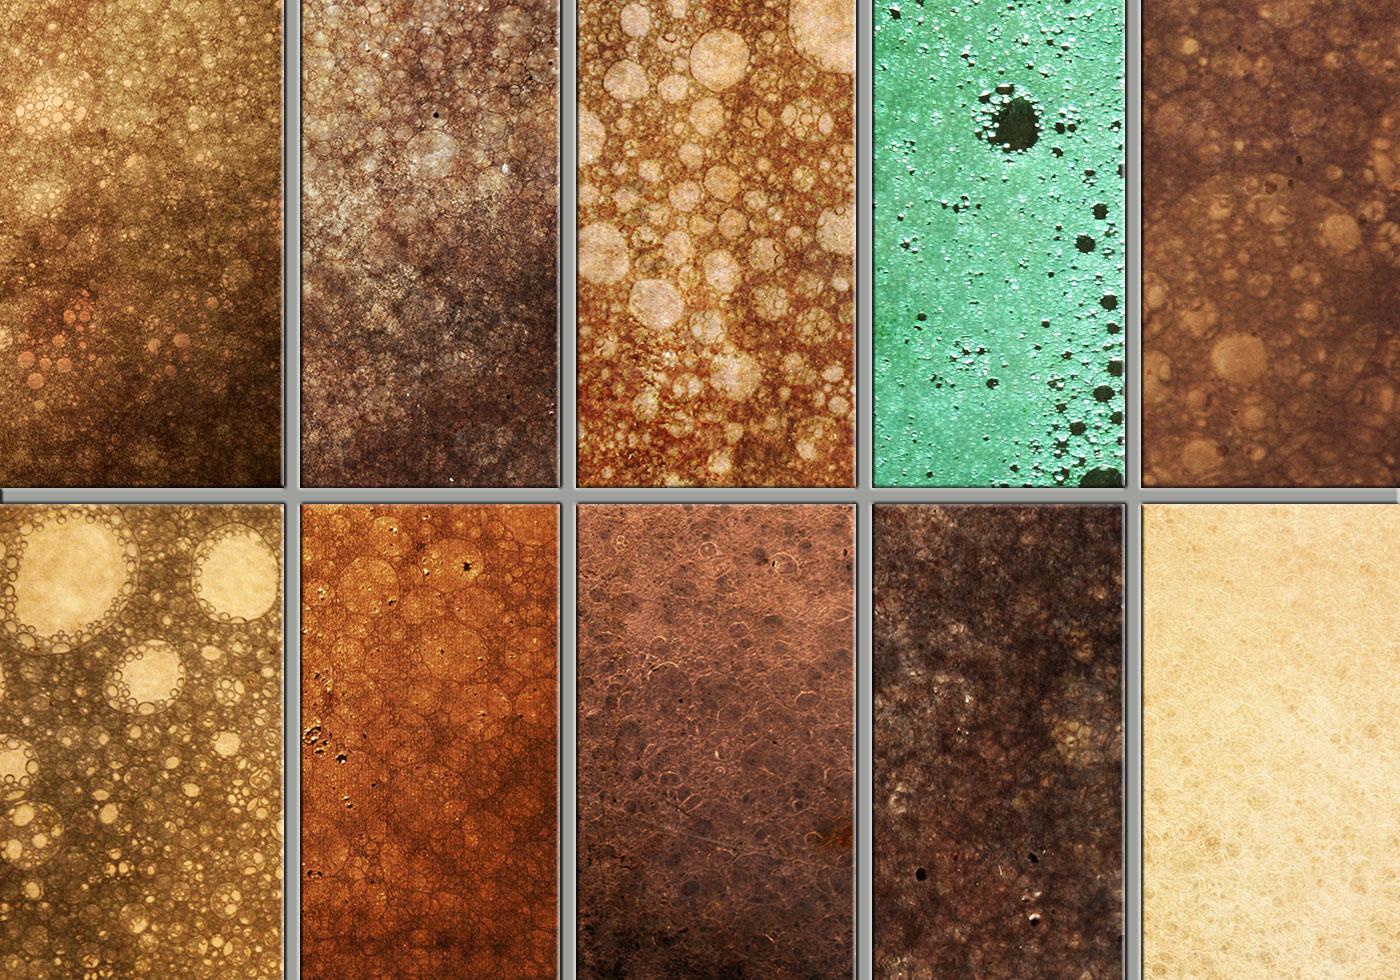 Grungy Bubble Textures - Free Photoshop Brushes at Brusheezy!